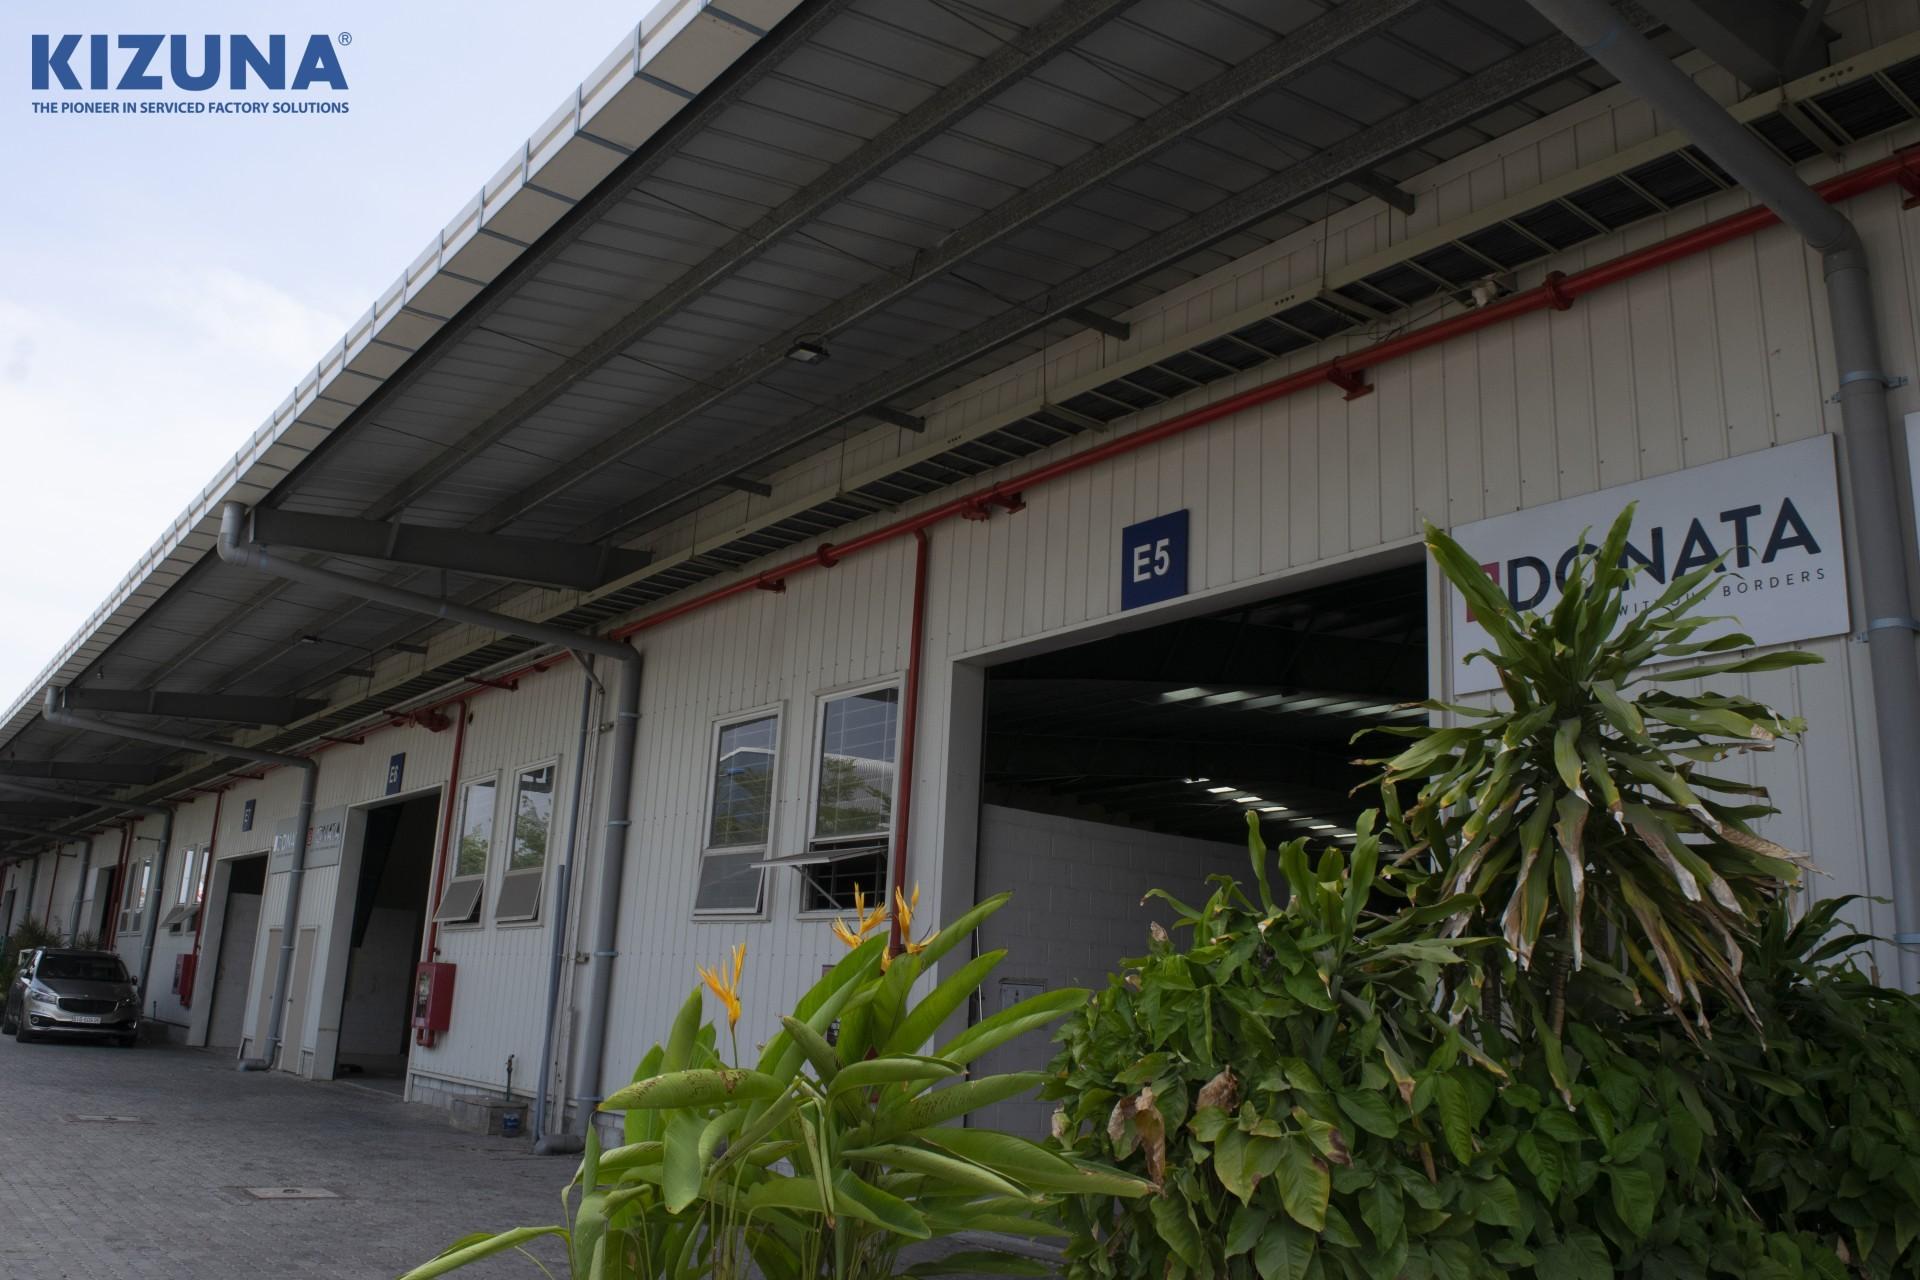 medium sized factory 2